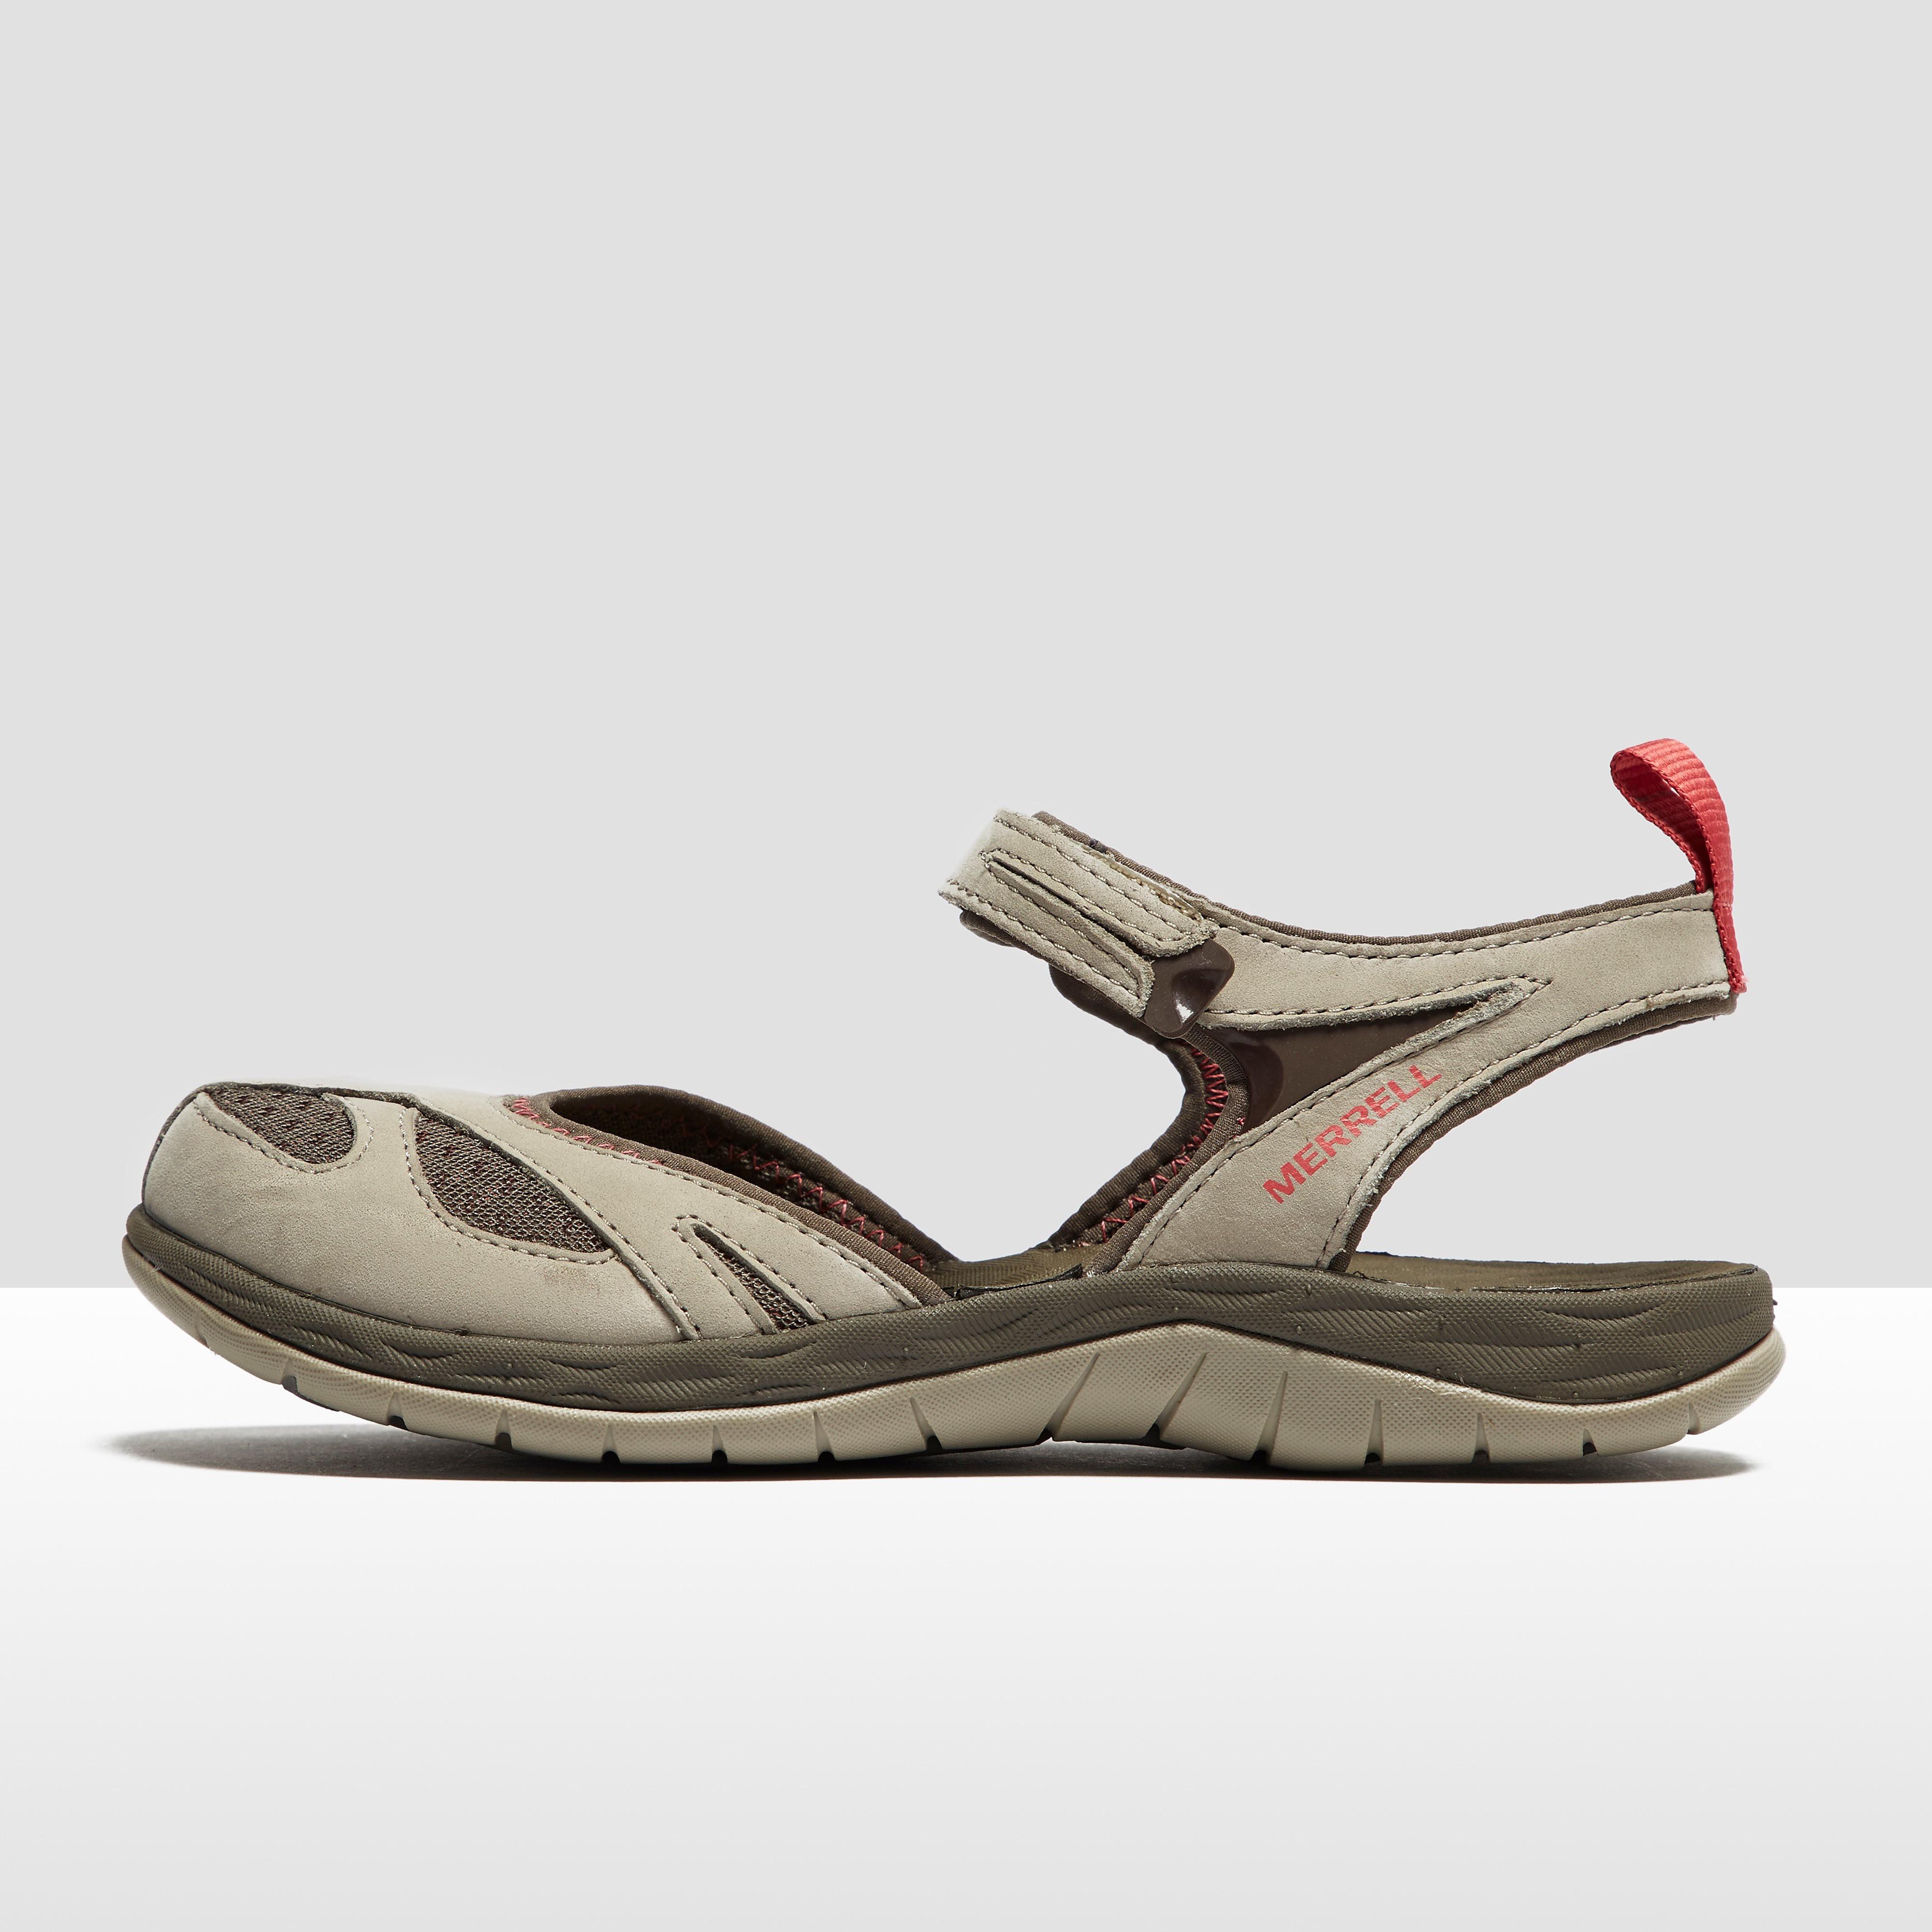 Merrell Siren Wrap Q2 Women's Walking Sandals